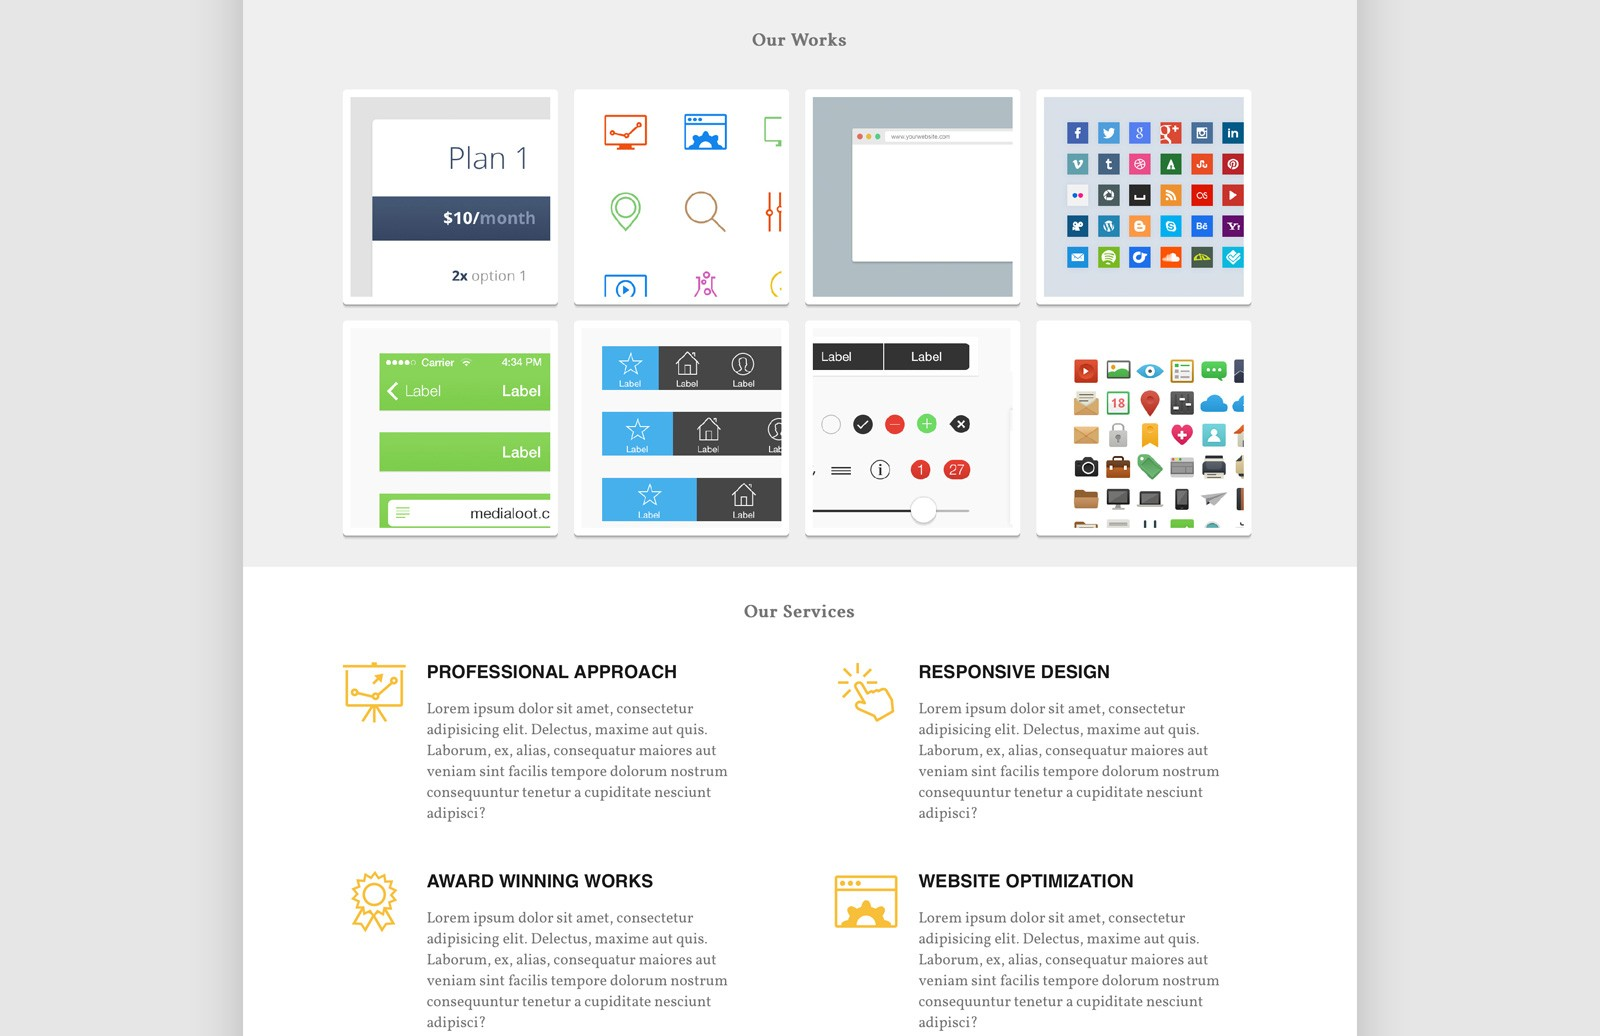 AmpPortfolio - Responsive HTML5/CSS3 theme for agencies 2